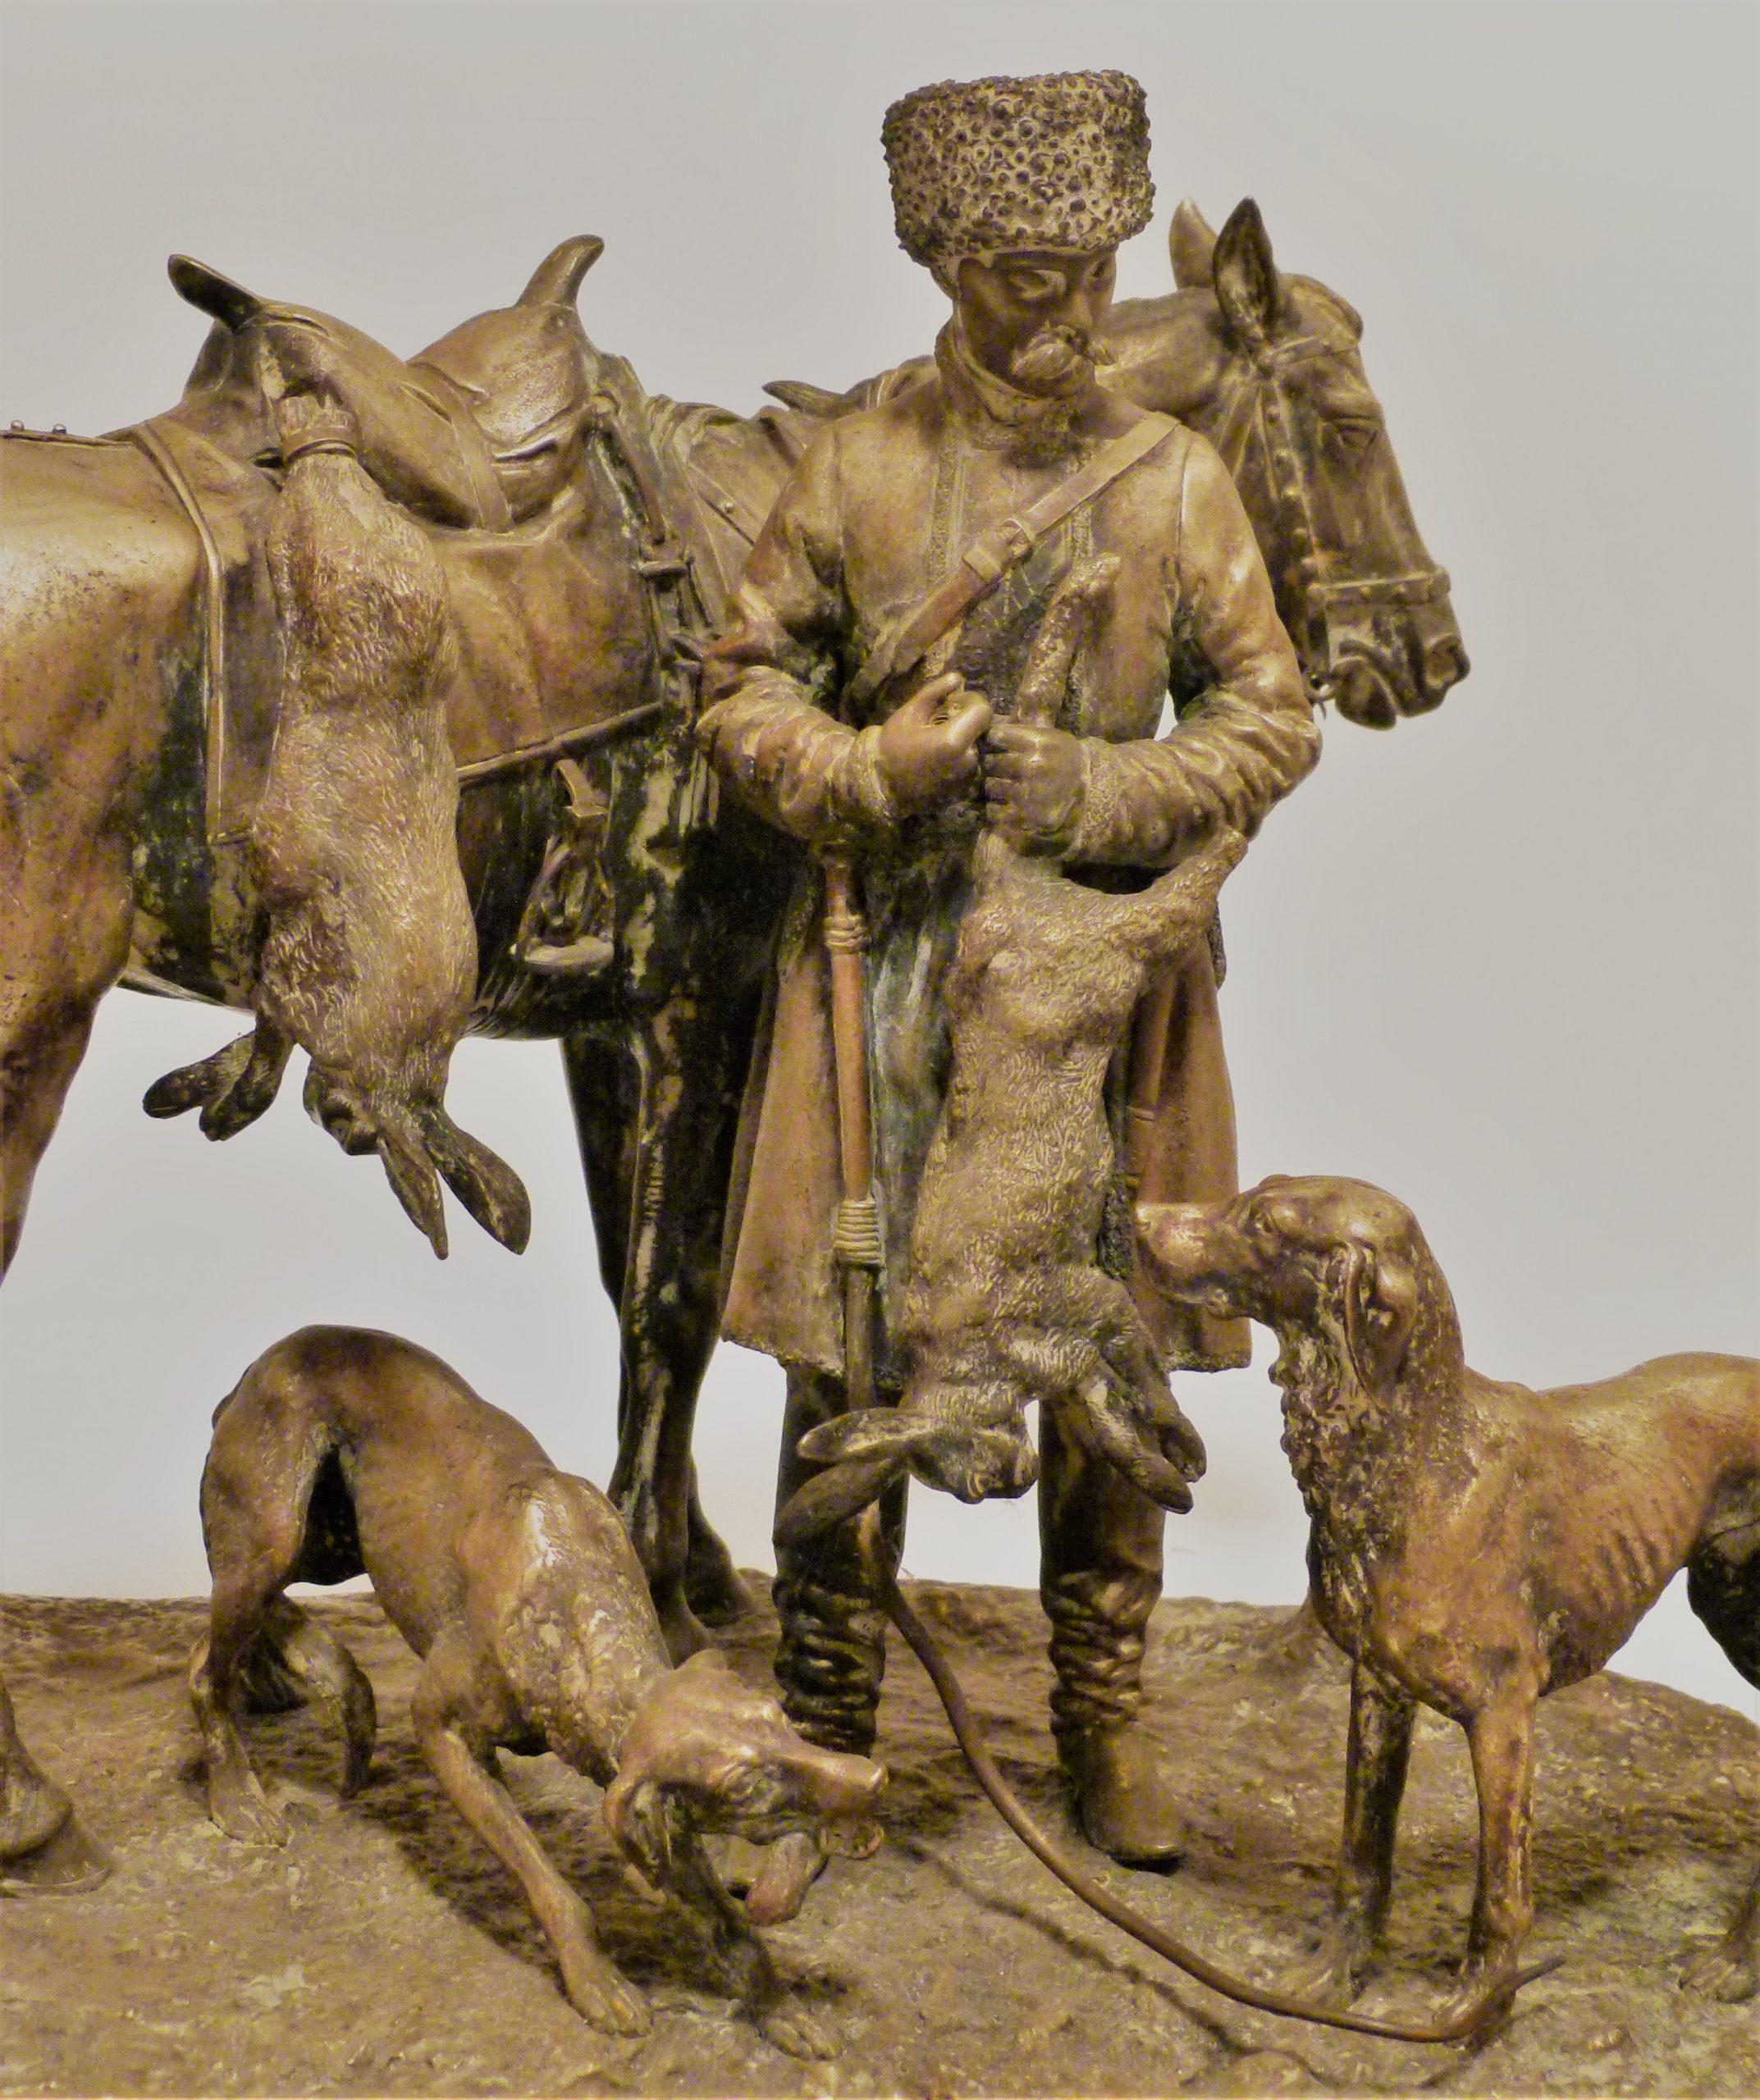 nikolay-ivanovivh-leiberich - Russian-bronze-rabbit-hunting-cossack-with-horse